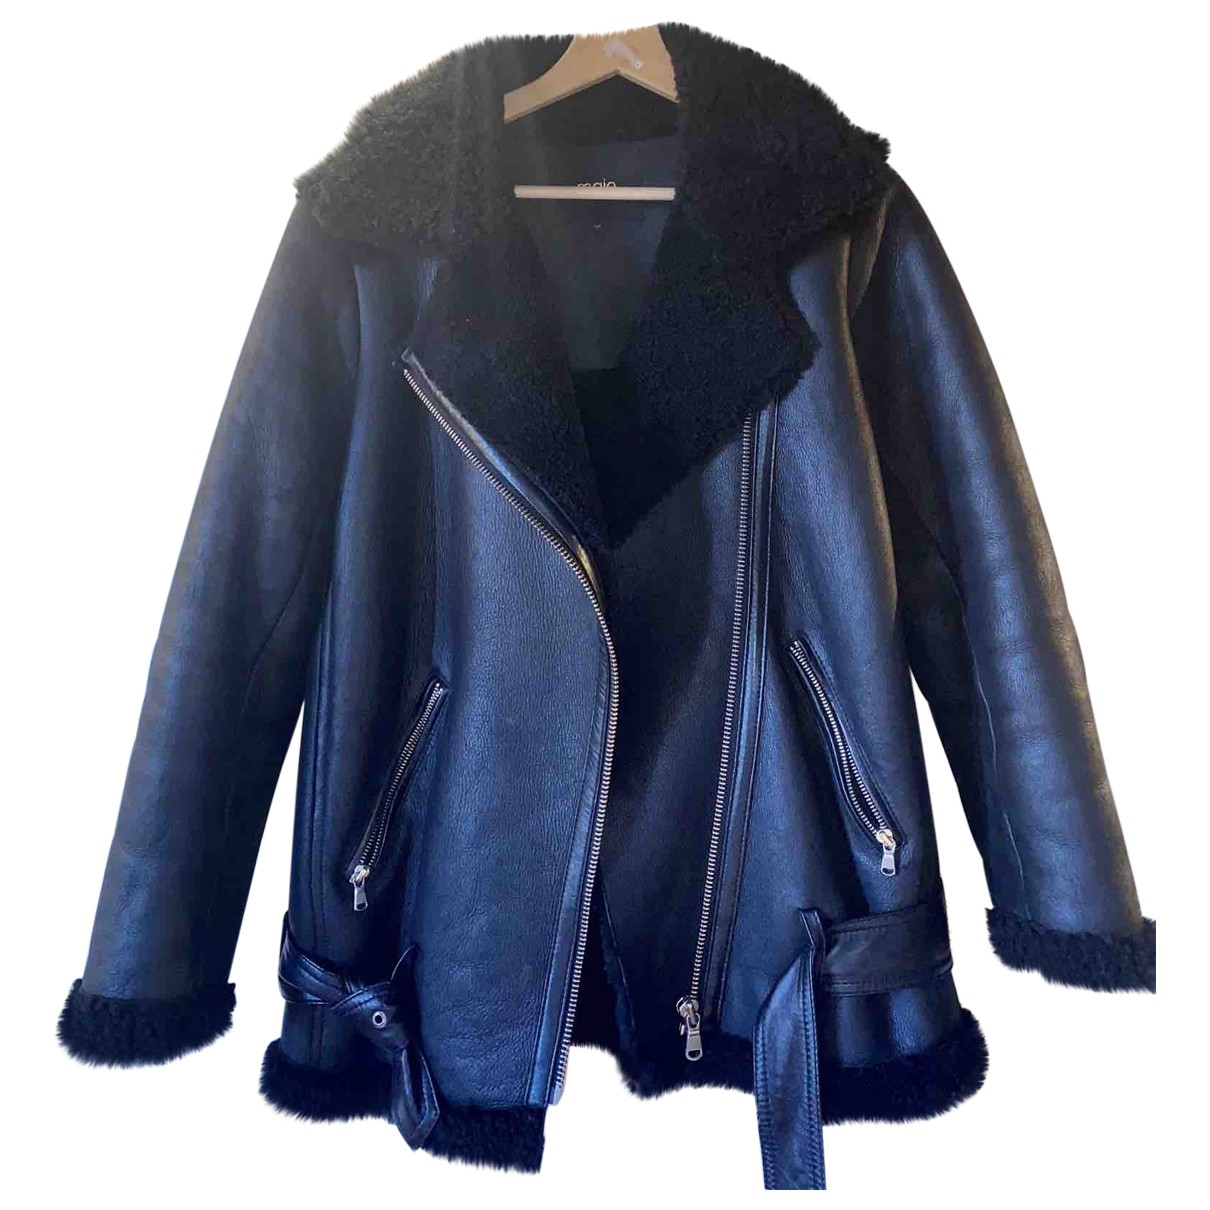 Maje Fall Winter 2019 Black Shearling jacket for Women 38 FR